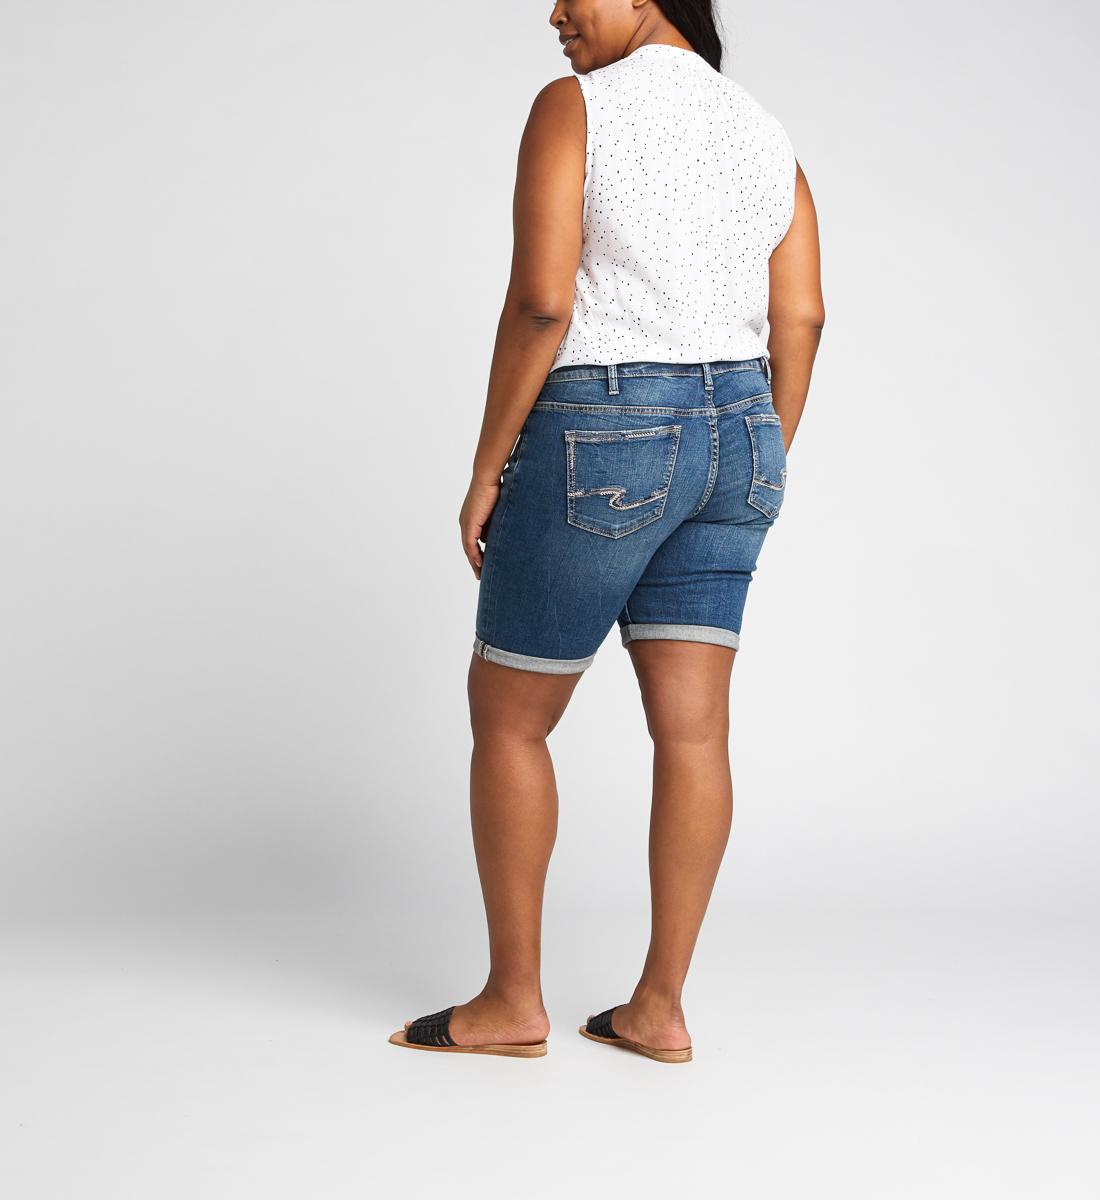 fa8f8d1d95 Elyse Mid Rise Bermuda Short Plus Size - Silver Jeans US